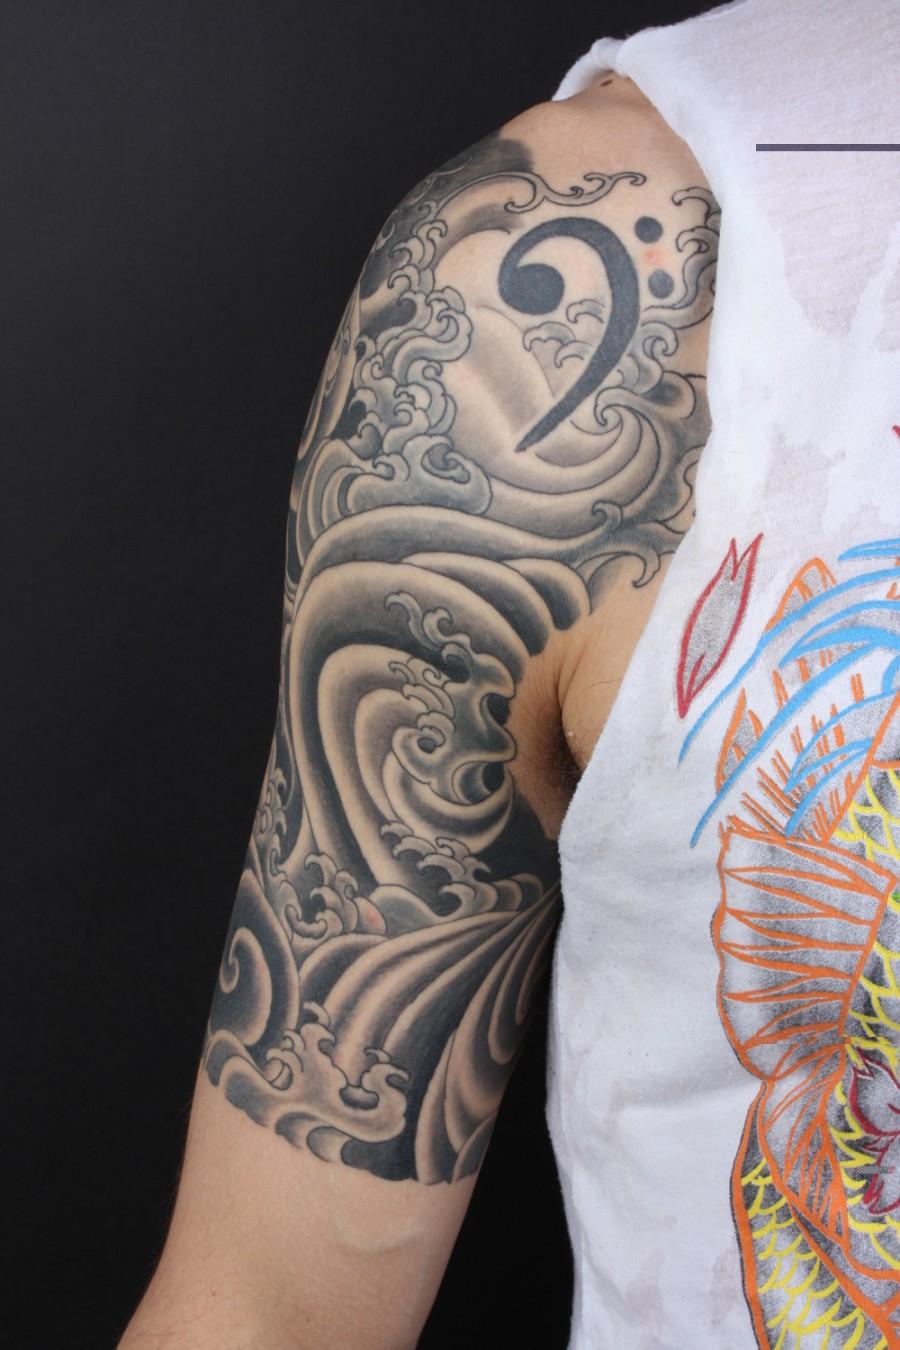 Quarter Sleeve Tattoo Ideas For Women Half Sleeve Tattoo Site